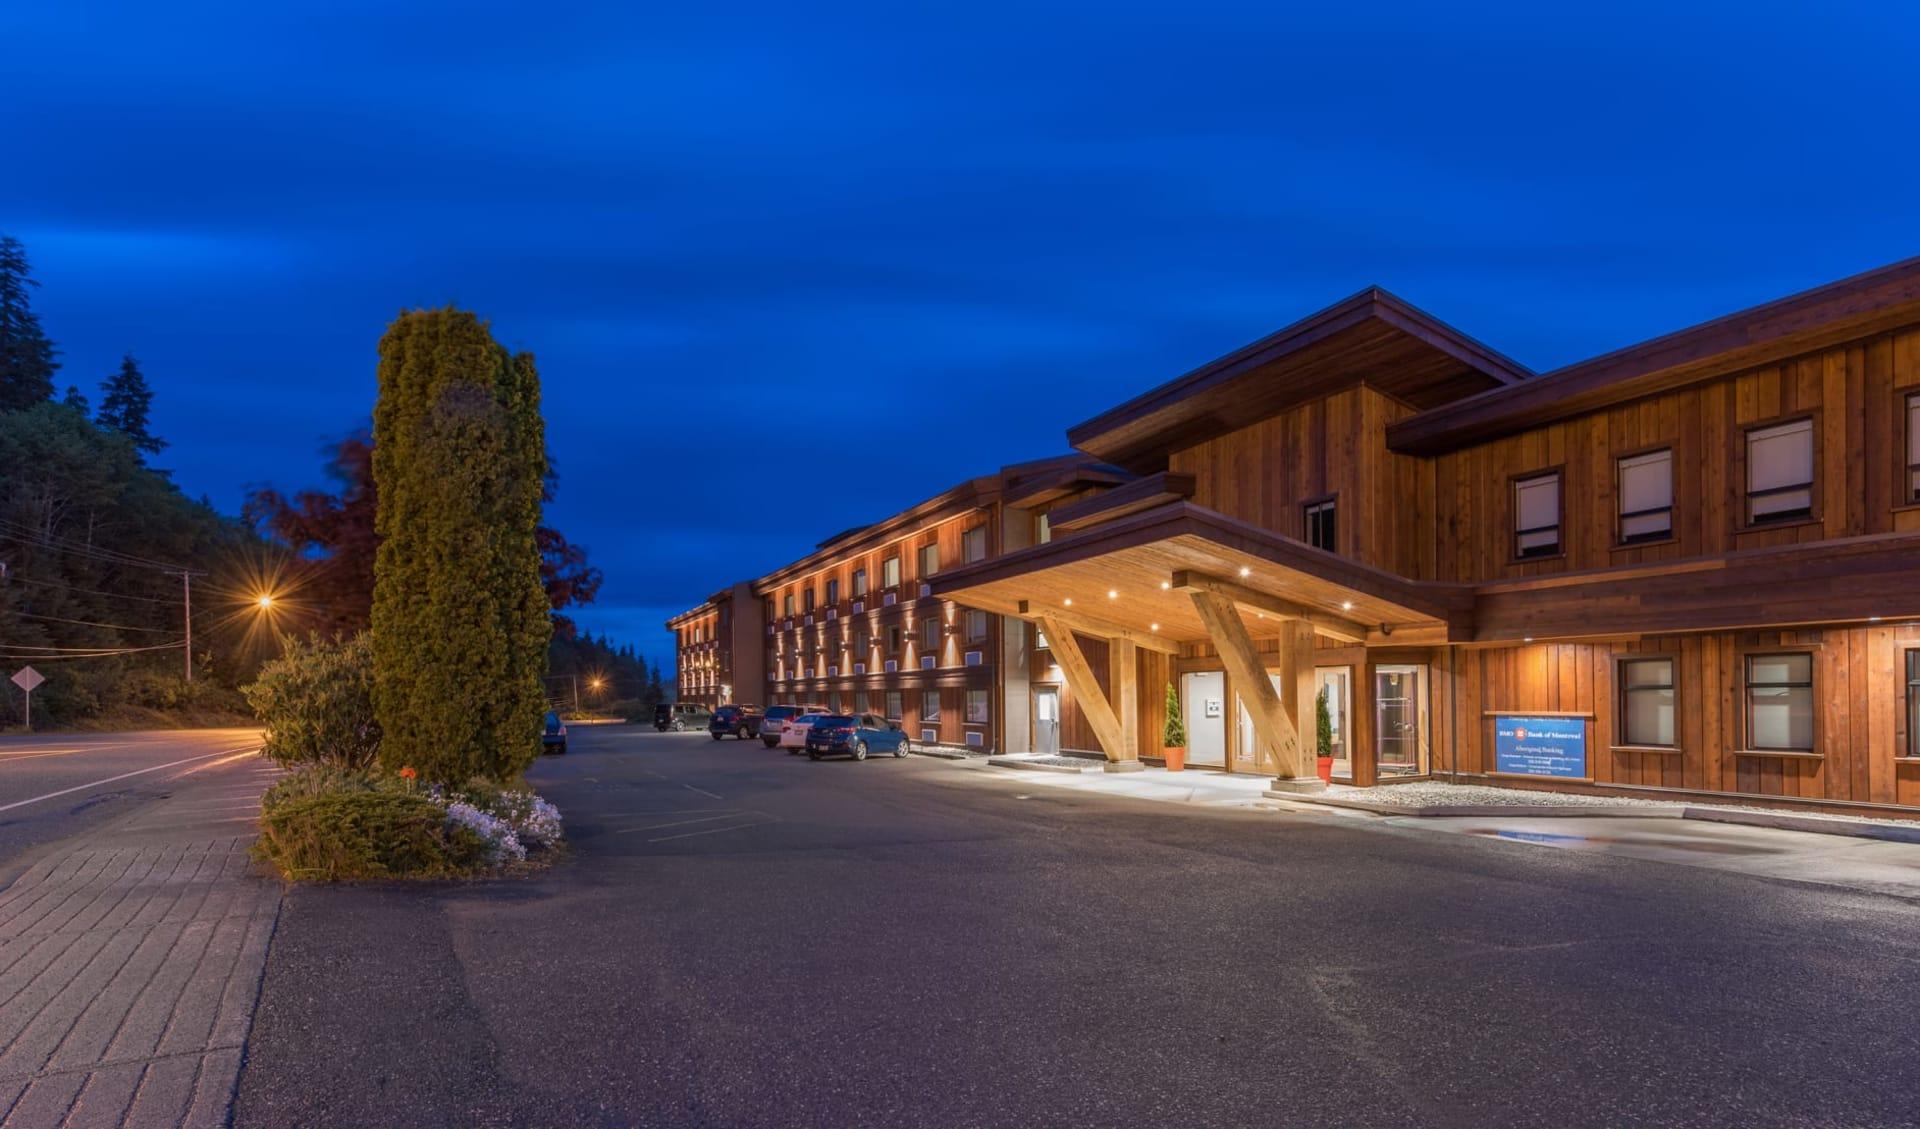 Kwa'Lilas Hotel in Port Hardy: Exterior_Kwa'Lilas Hotel_Aussenansicht_Jonview